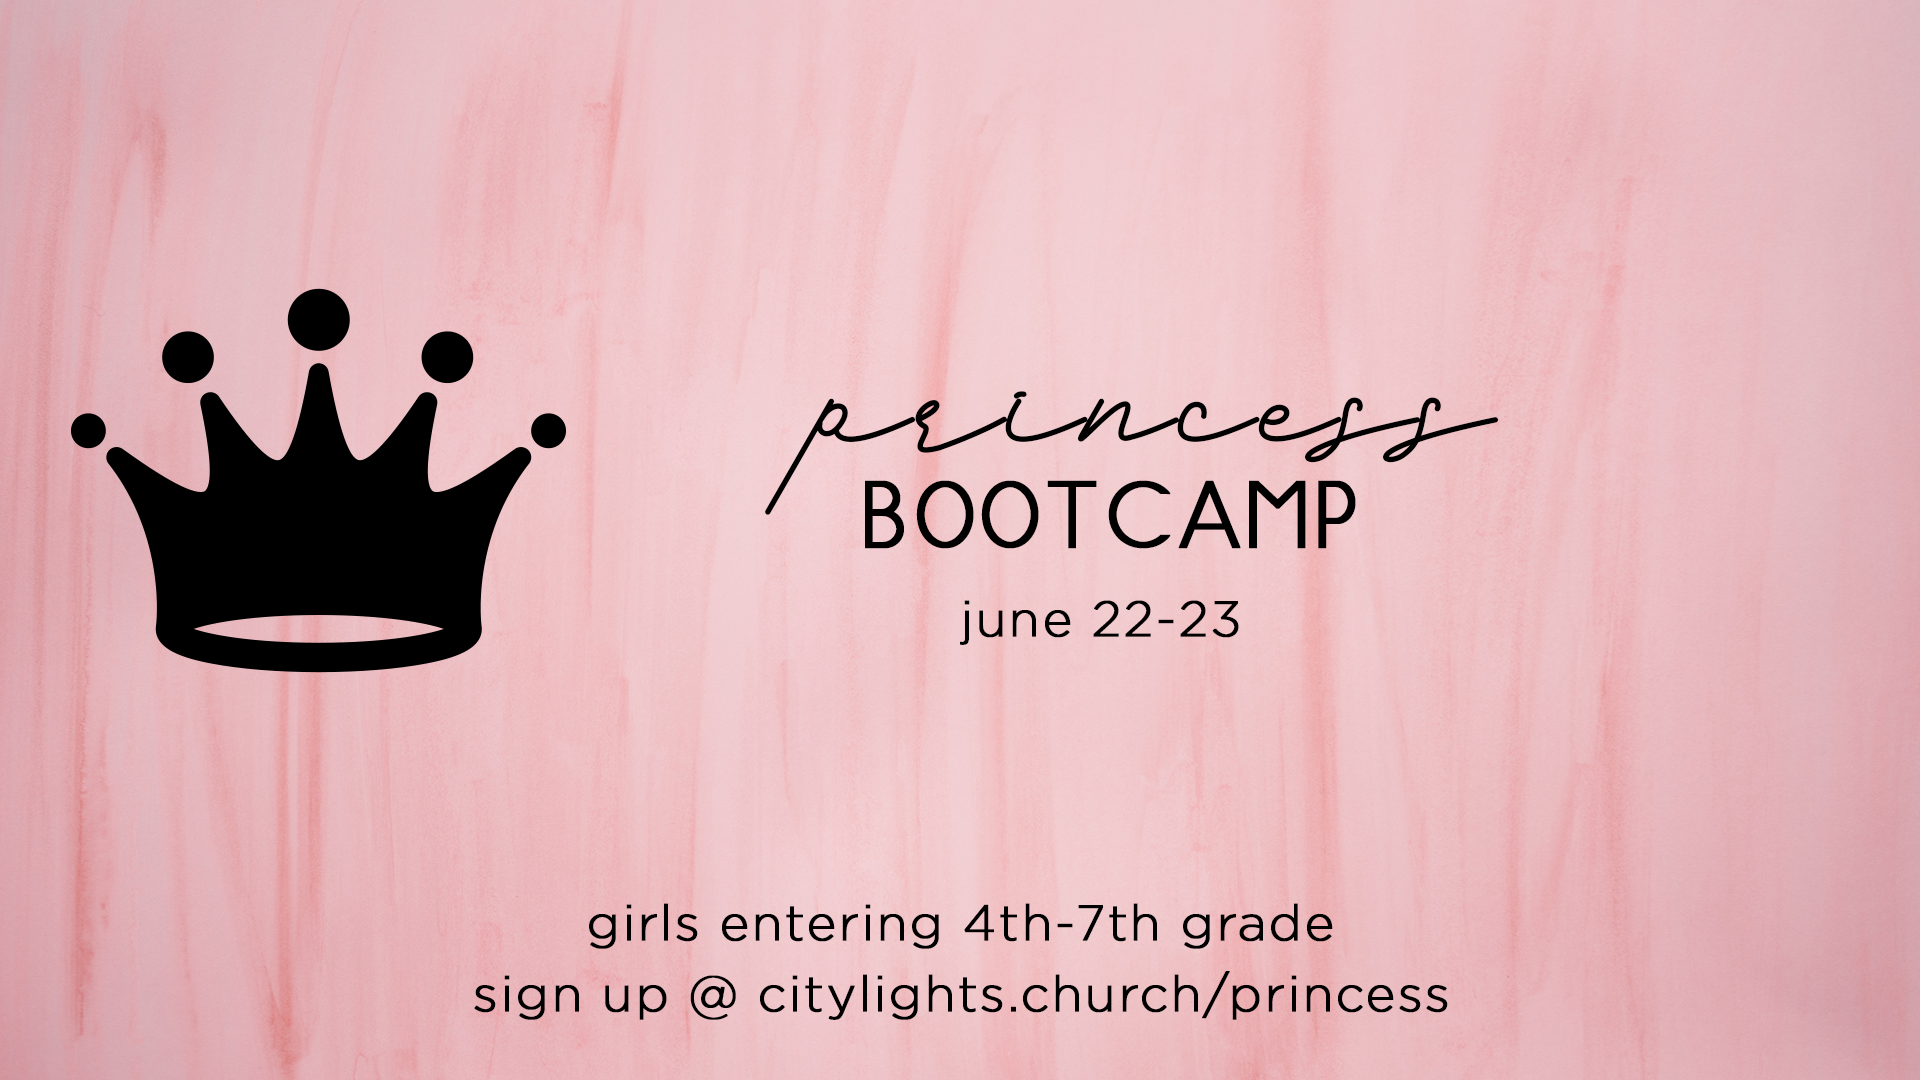 princessbootcamp.png